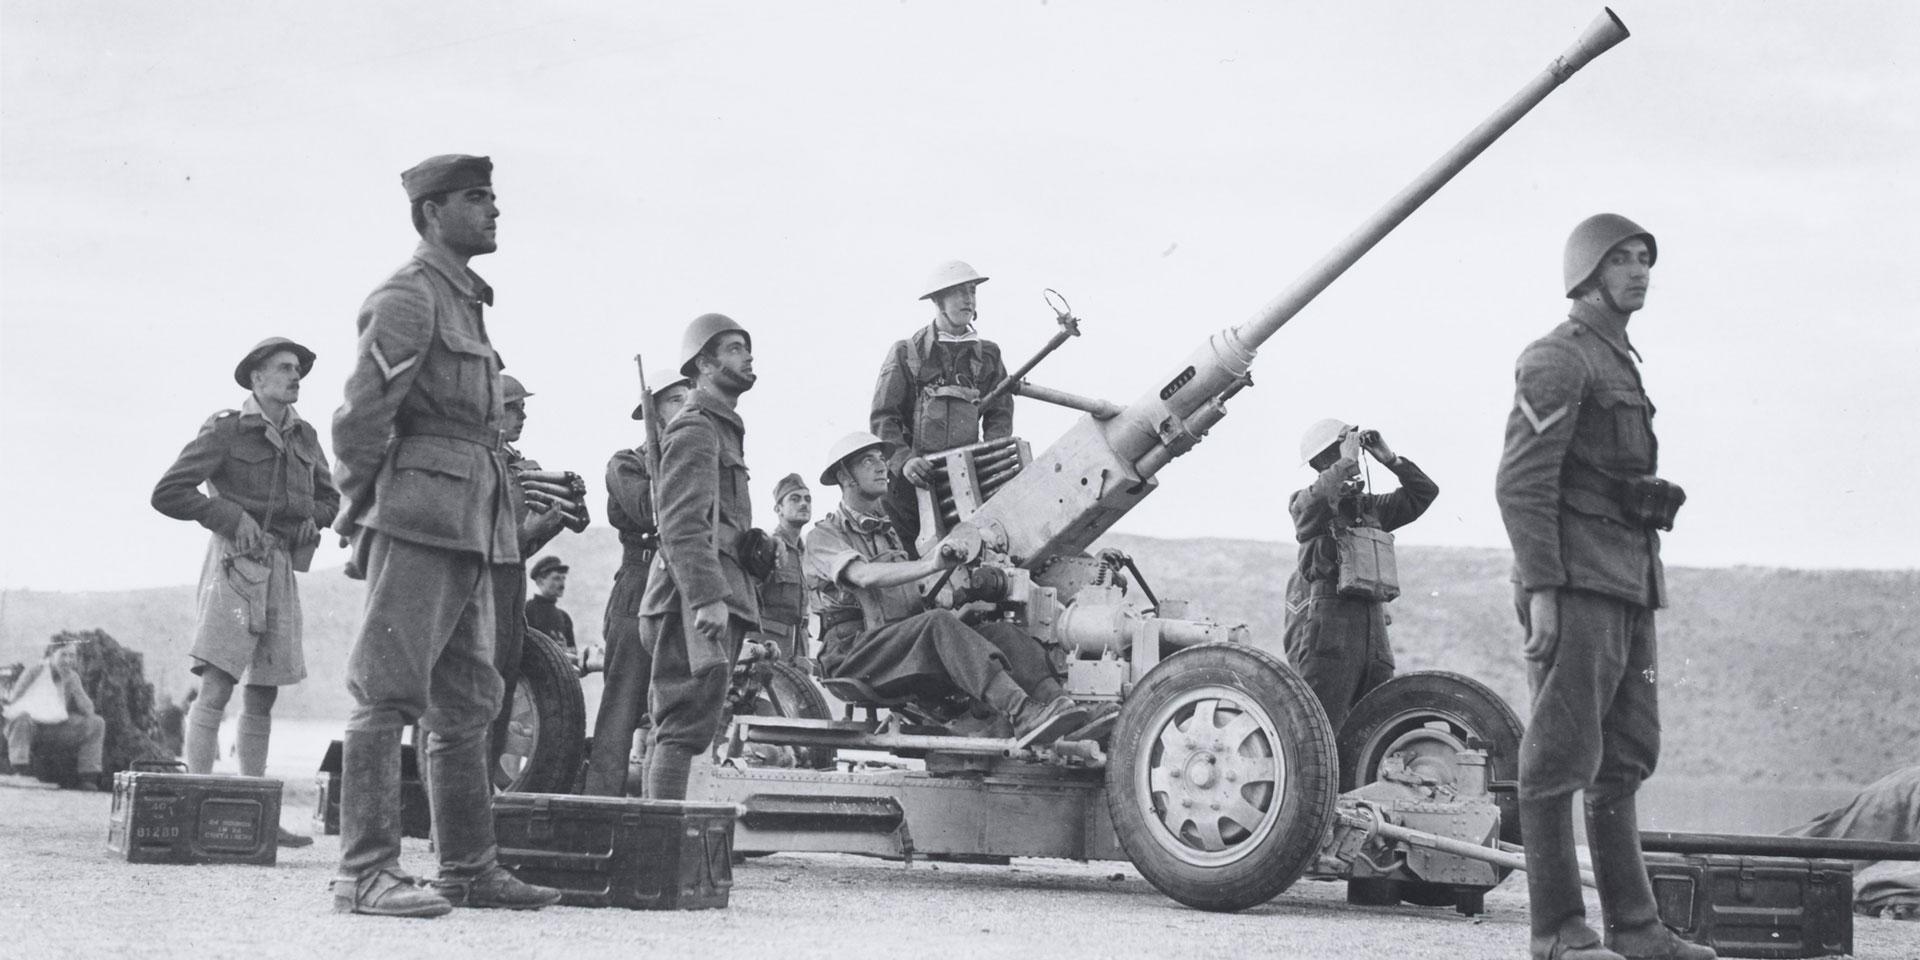 Greek and British soldiers man an anti-aircraft gun, 1941